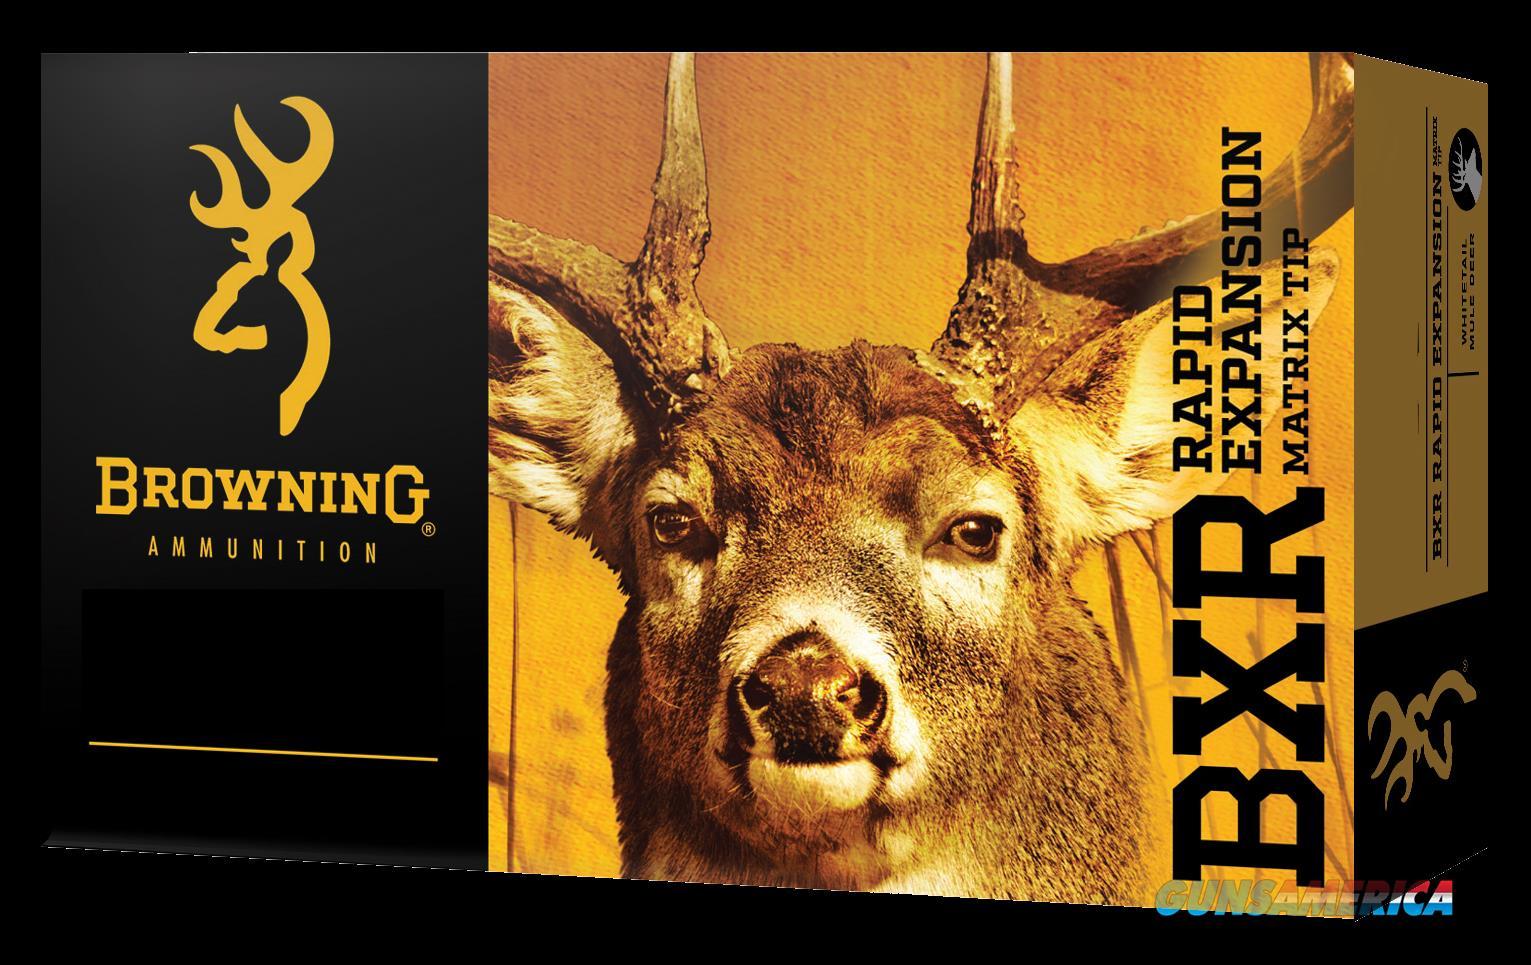 Browning Ammo Bxr, Brna B192107081    7mm08  144 Bxr Deer       20-10  Guns > Pistols > 1911 Pistol Copies (non-Colt)